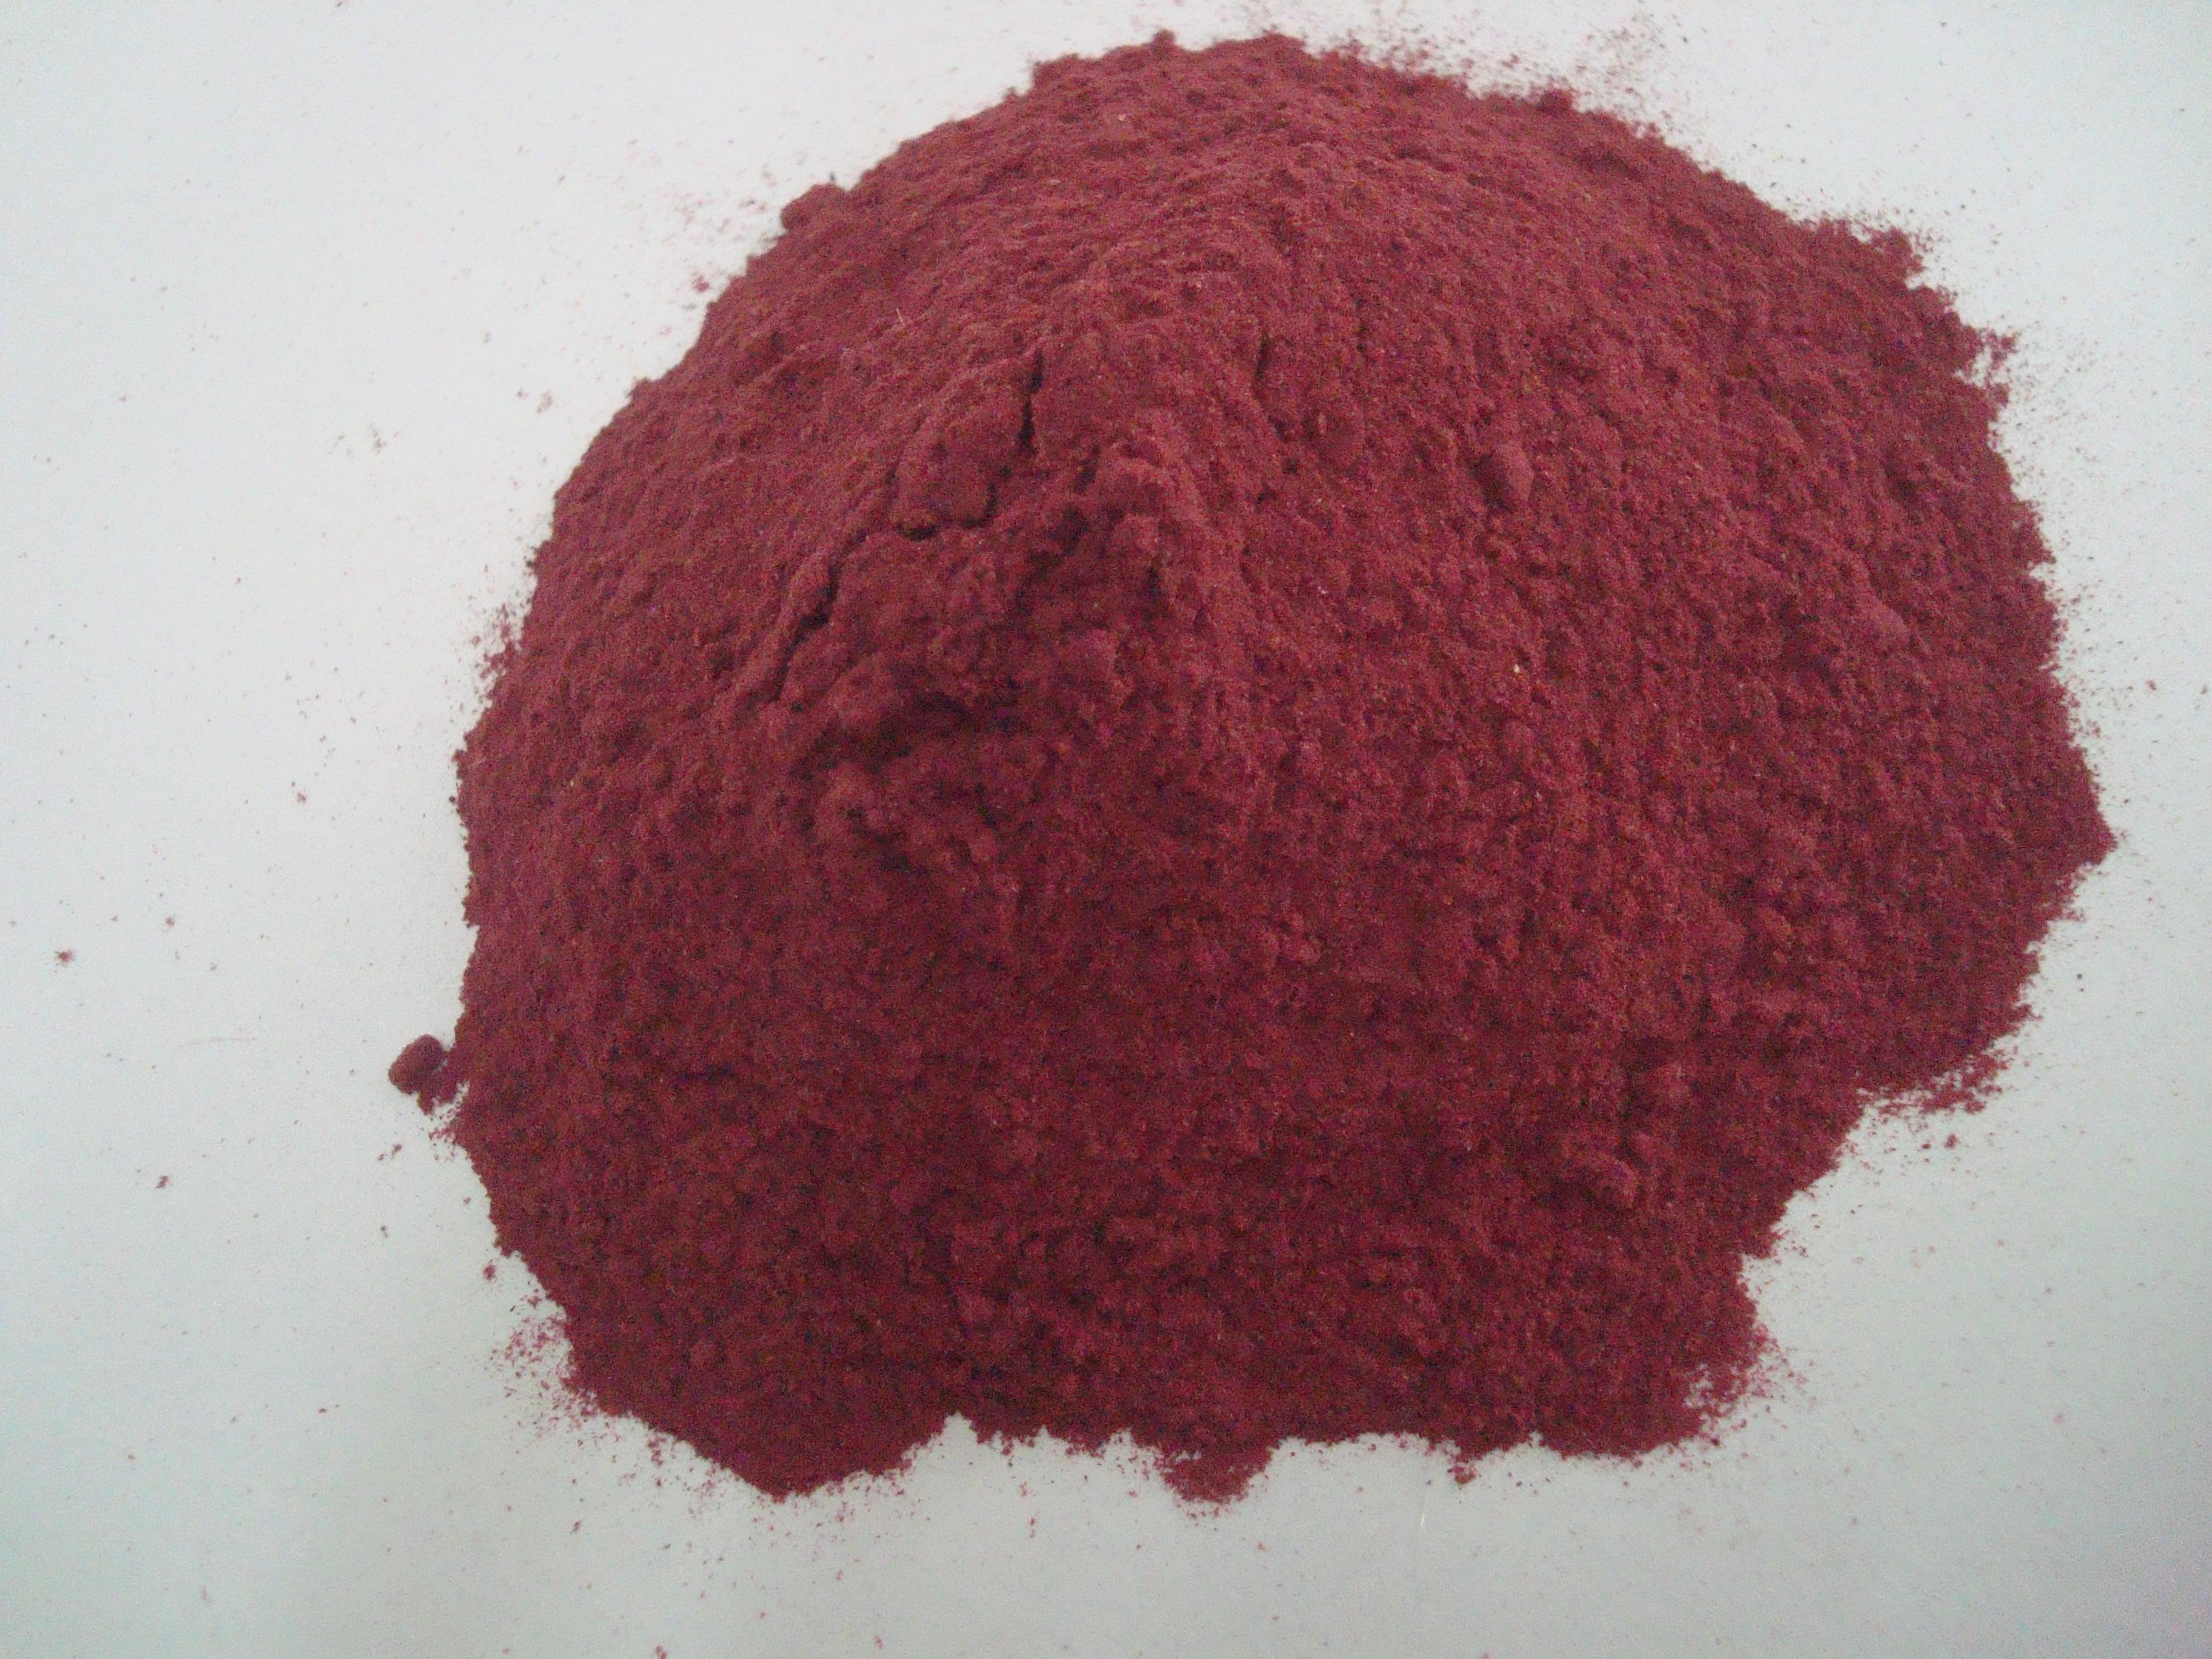 Hibiscus Flakes Hibiscus Powder Manufacturer Supplier